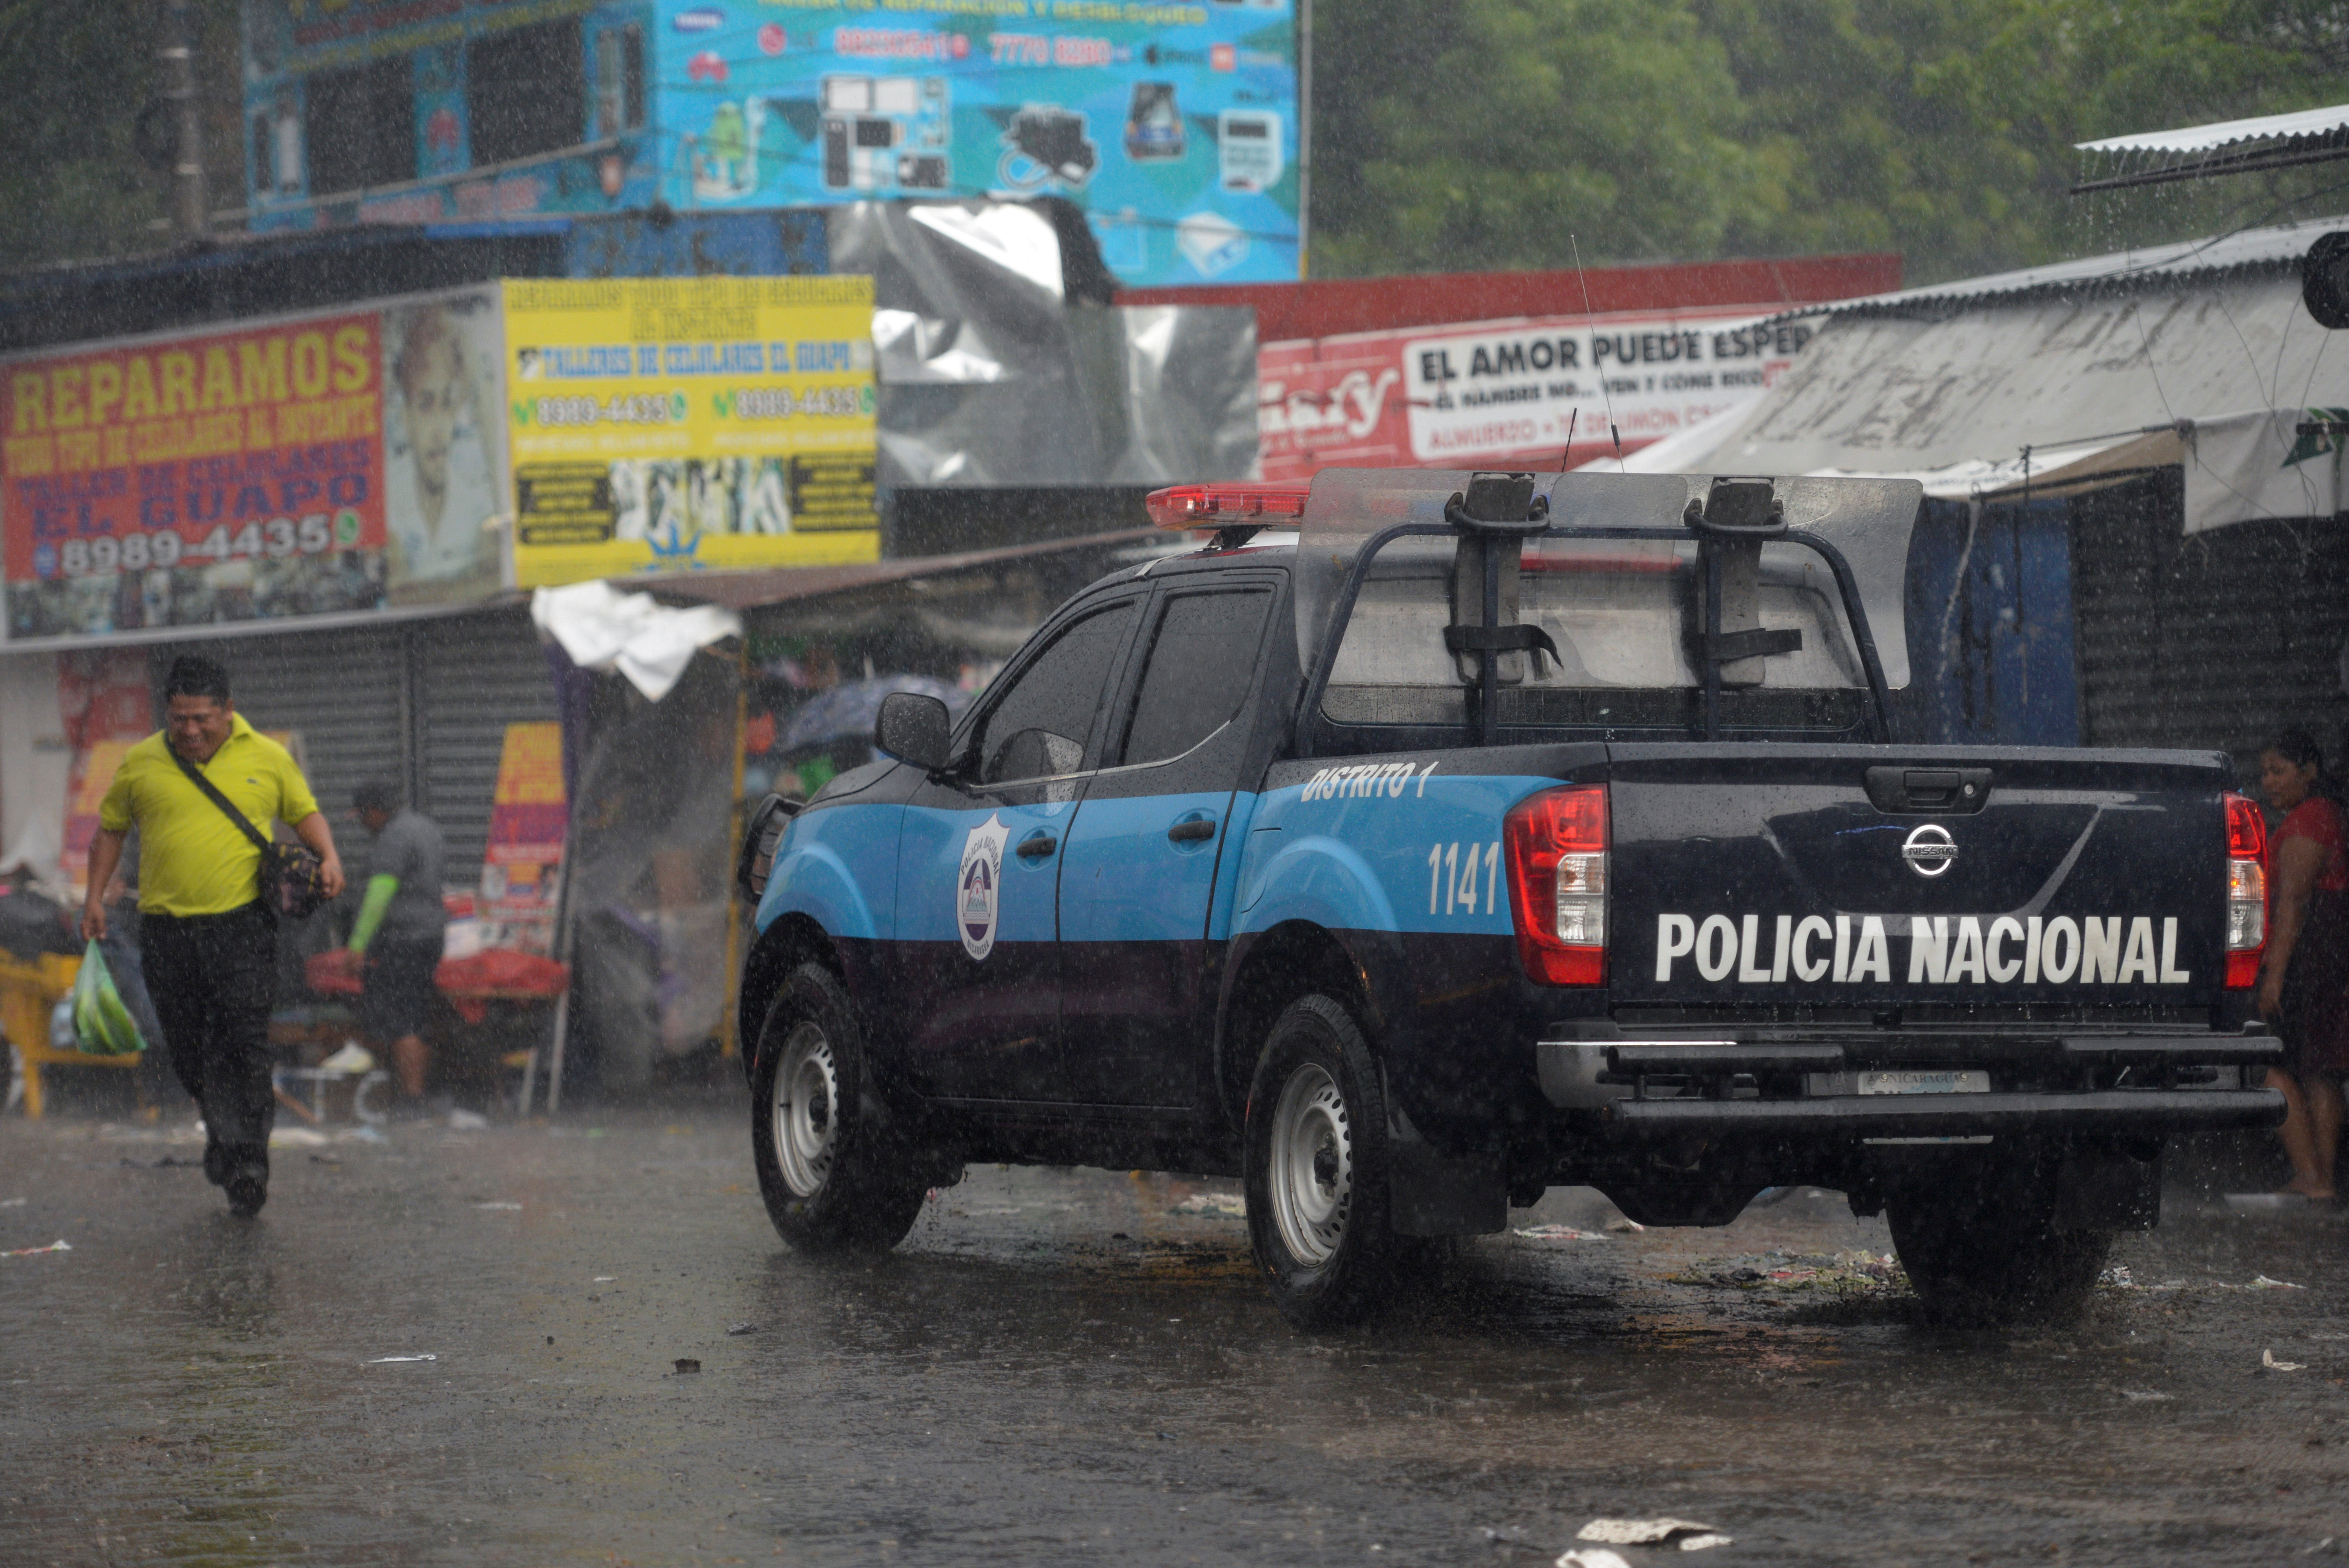 Nicaraguan National Police patrols outside a market in Managua, Nicaragua June 21, 2021.  REUTERS/Stringer